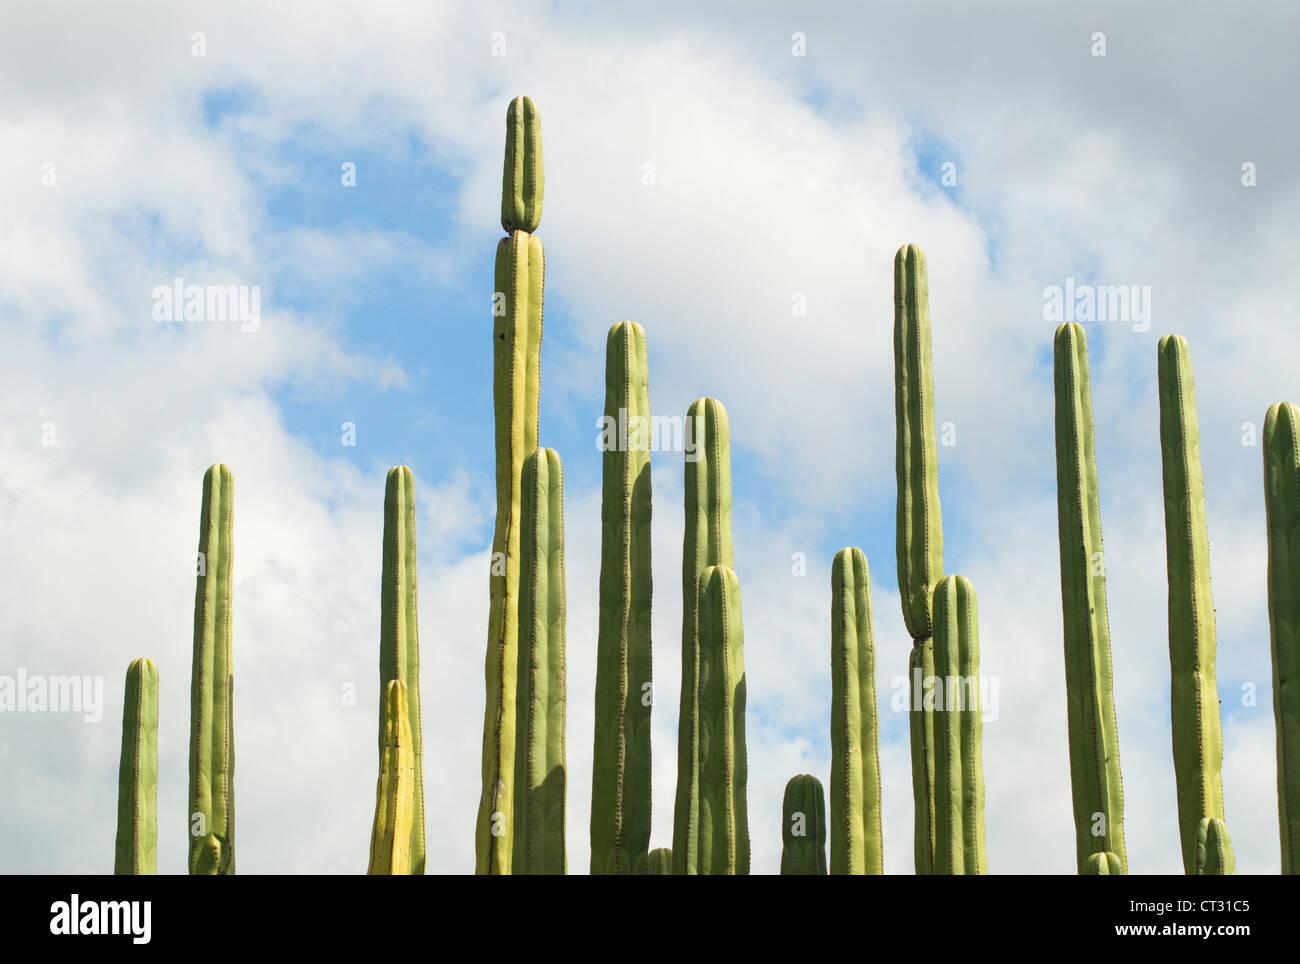 Pachycereus Marginatus, Cactus, mexican fence post cactus Stock Photo